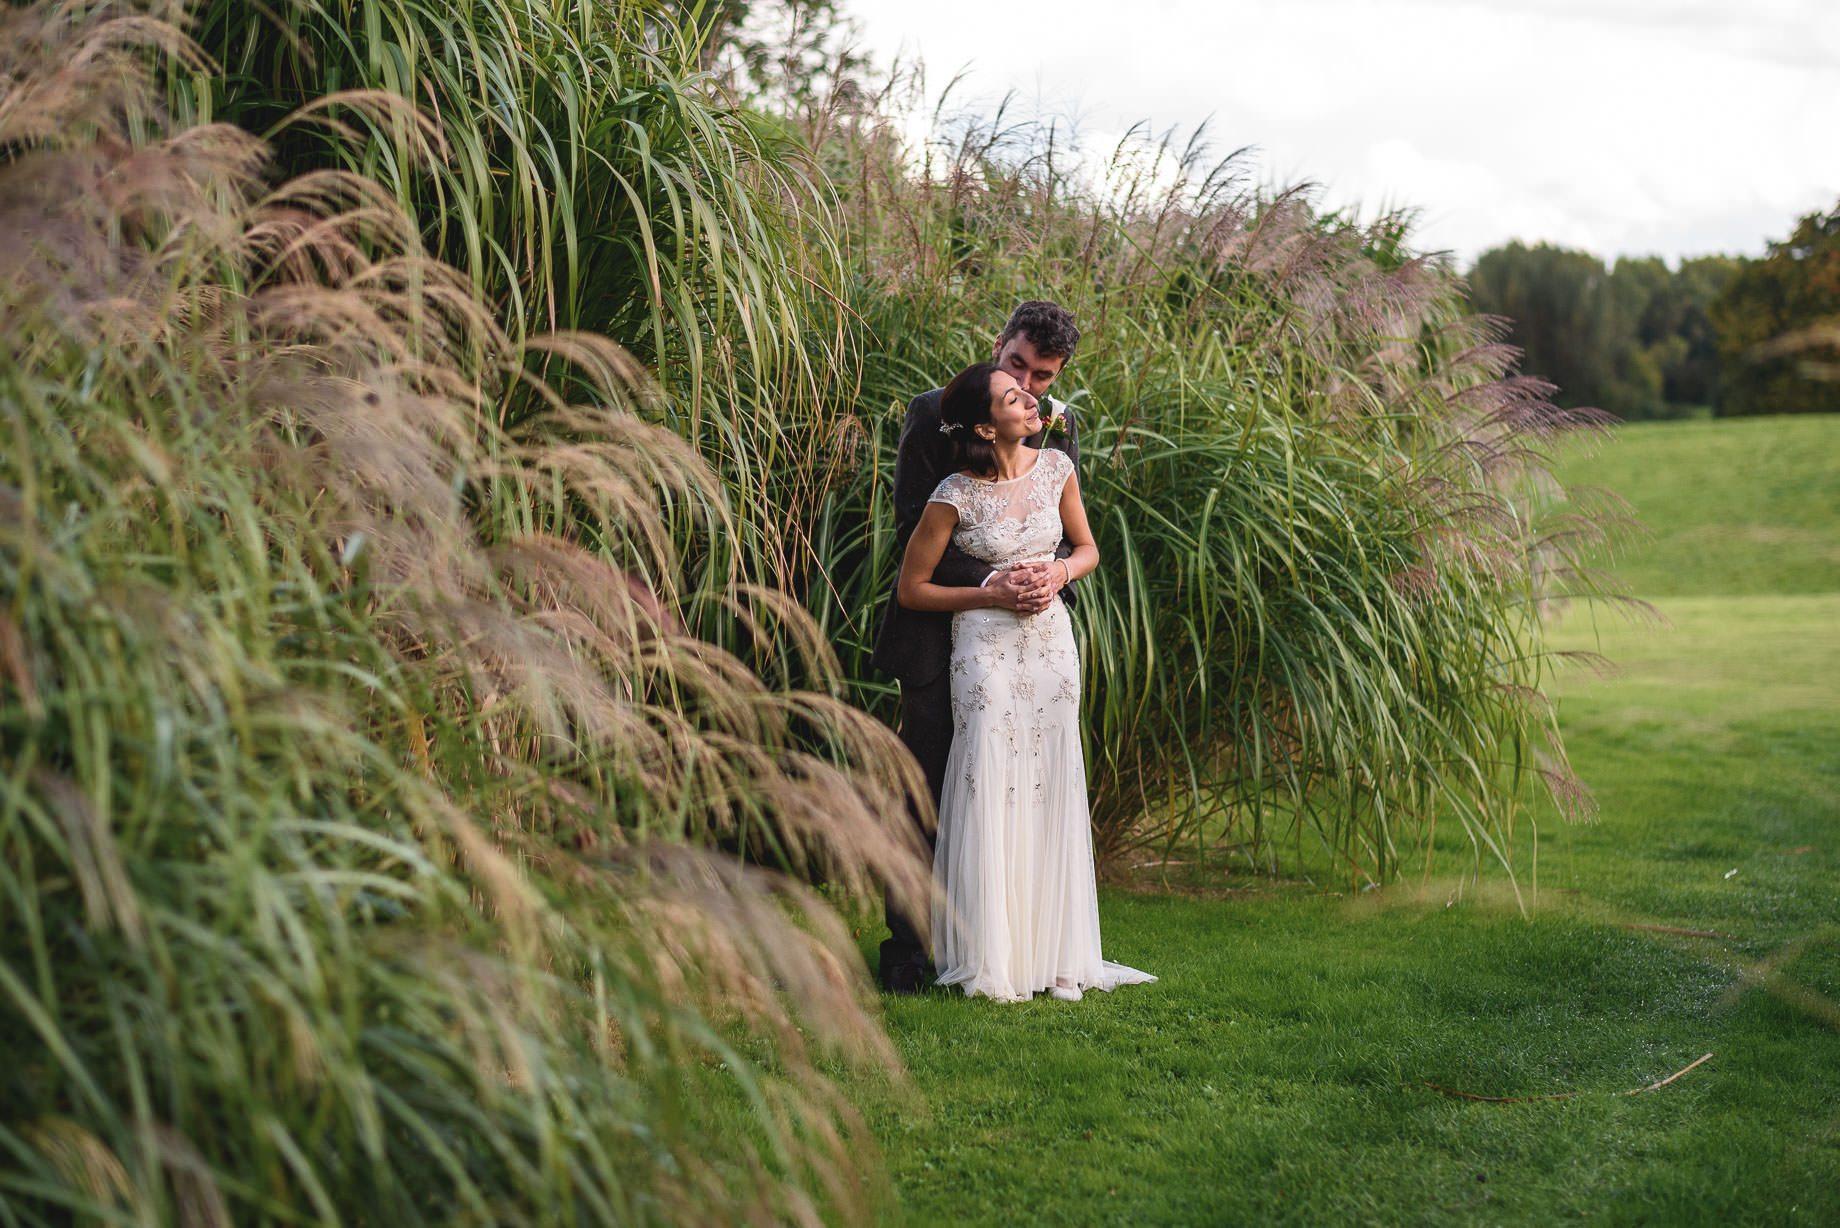 bury-court-barn-wedding-photography-guy-collier-photography-nadia-tom-103-of-184